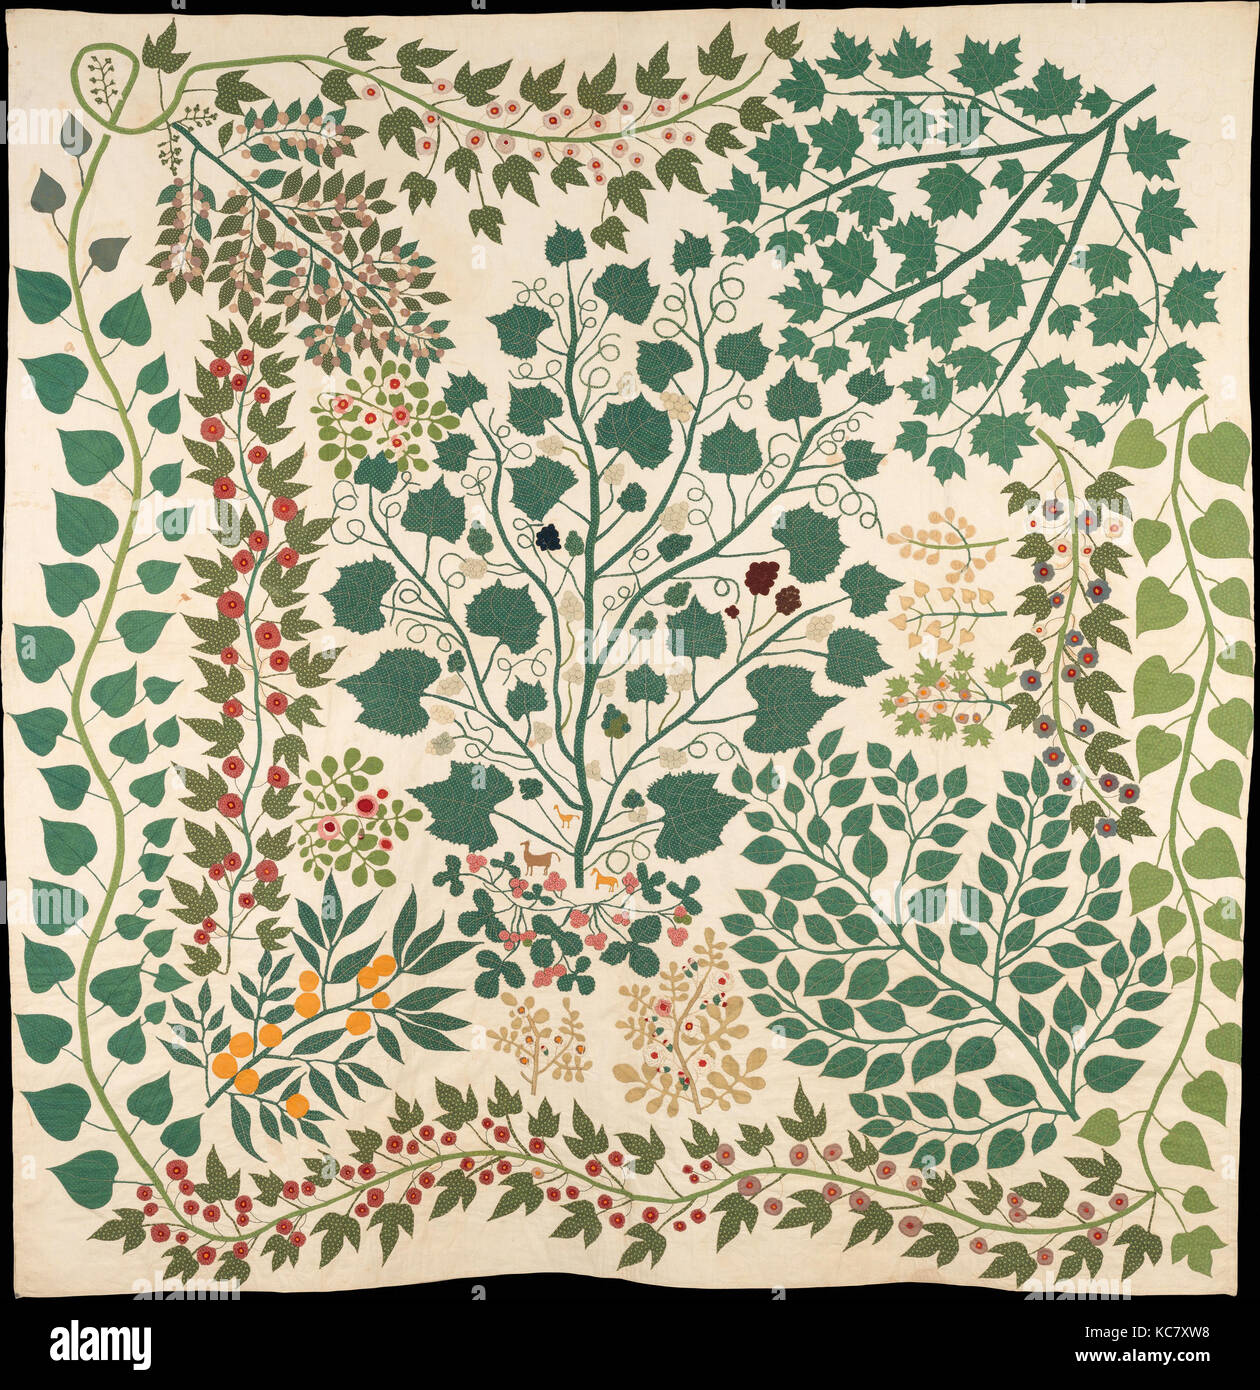 Branches and Vines Quilt, Ernestine Eberhardt Zaumseil, ca. 1875 - Stock Image